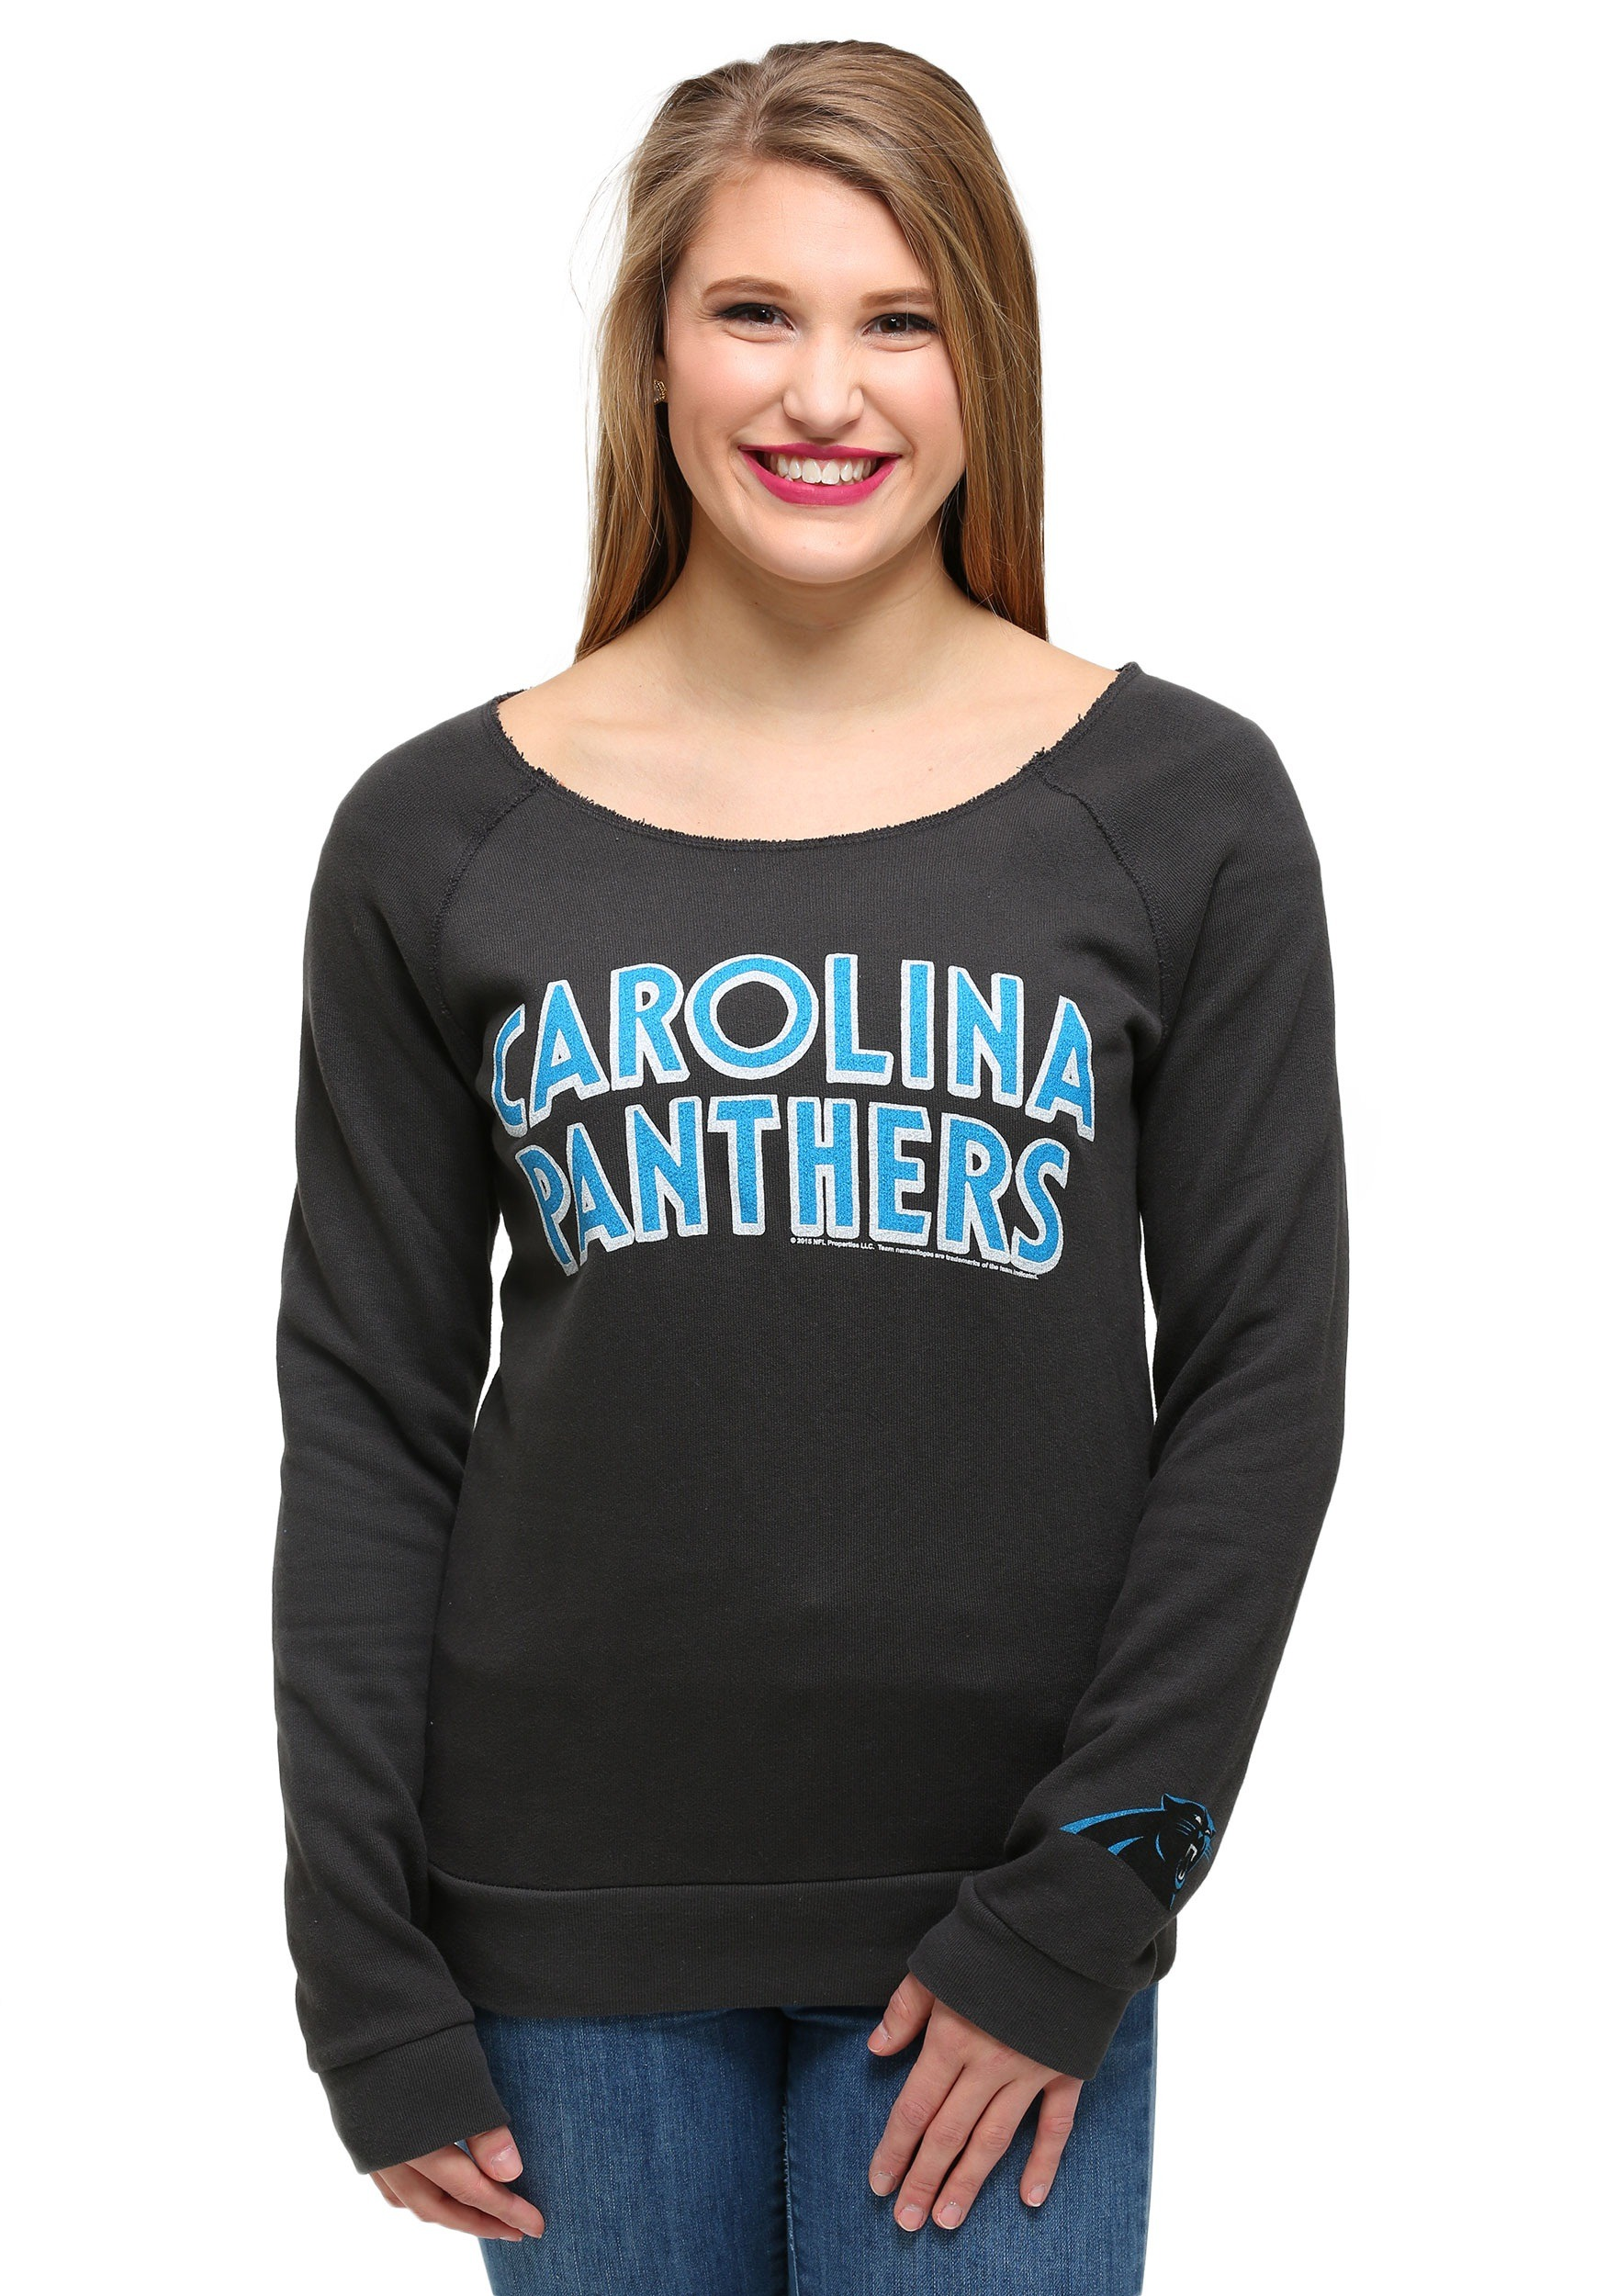 Women's Carolina Panthers Junk Food Black Time Out Tank Top